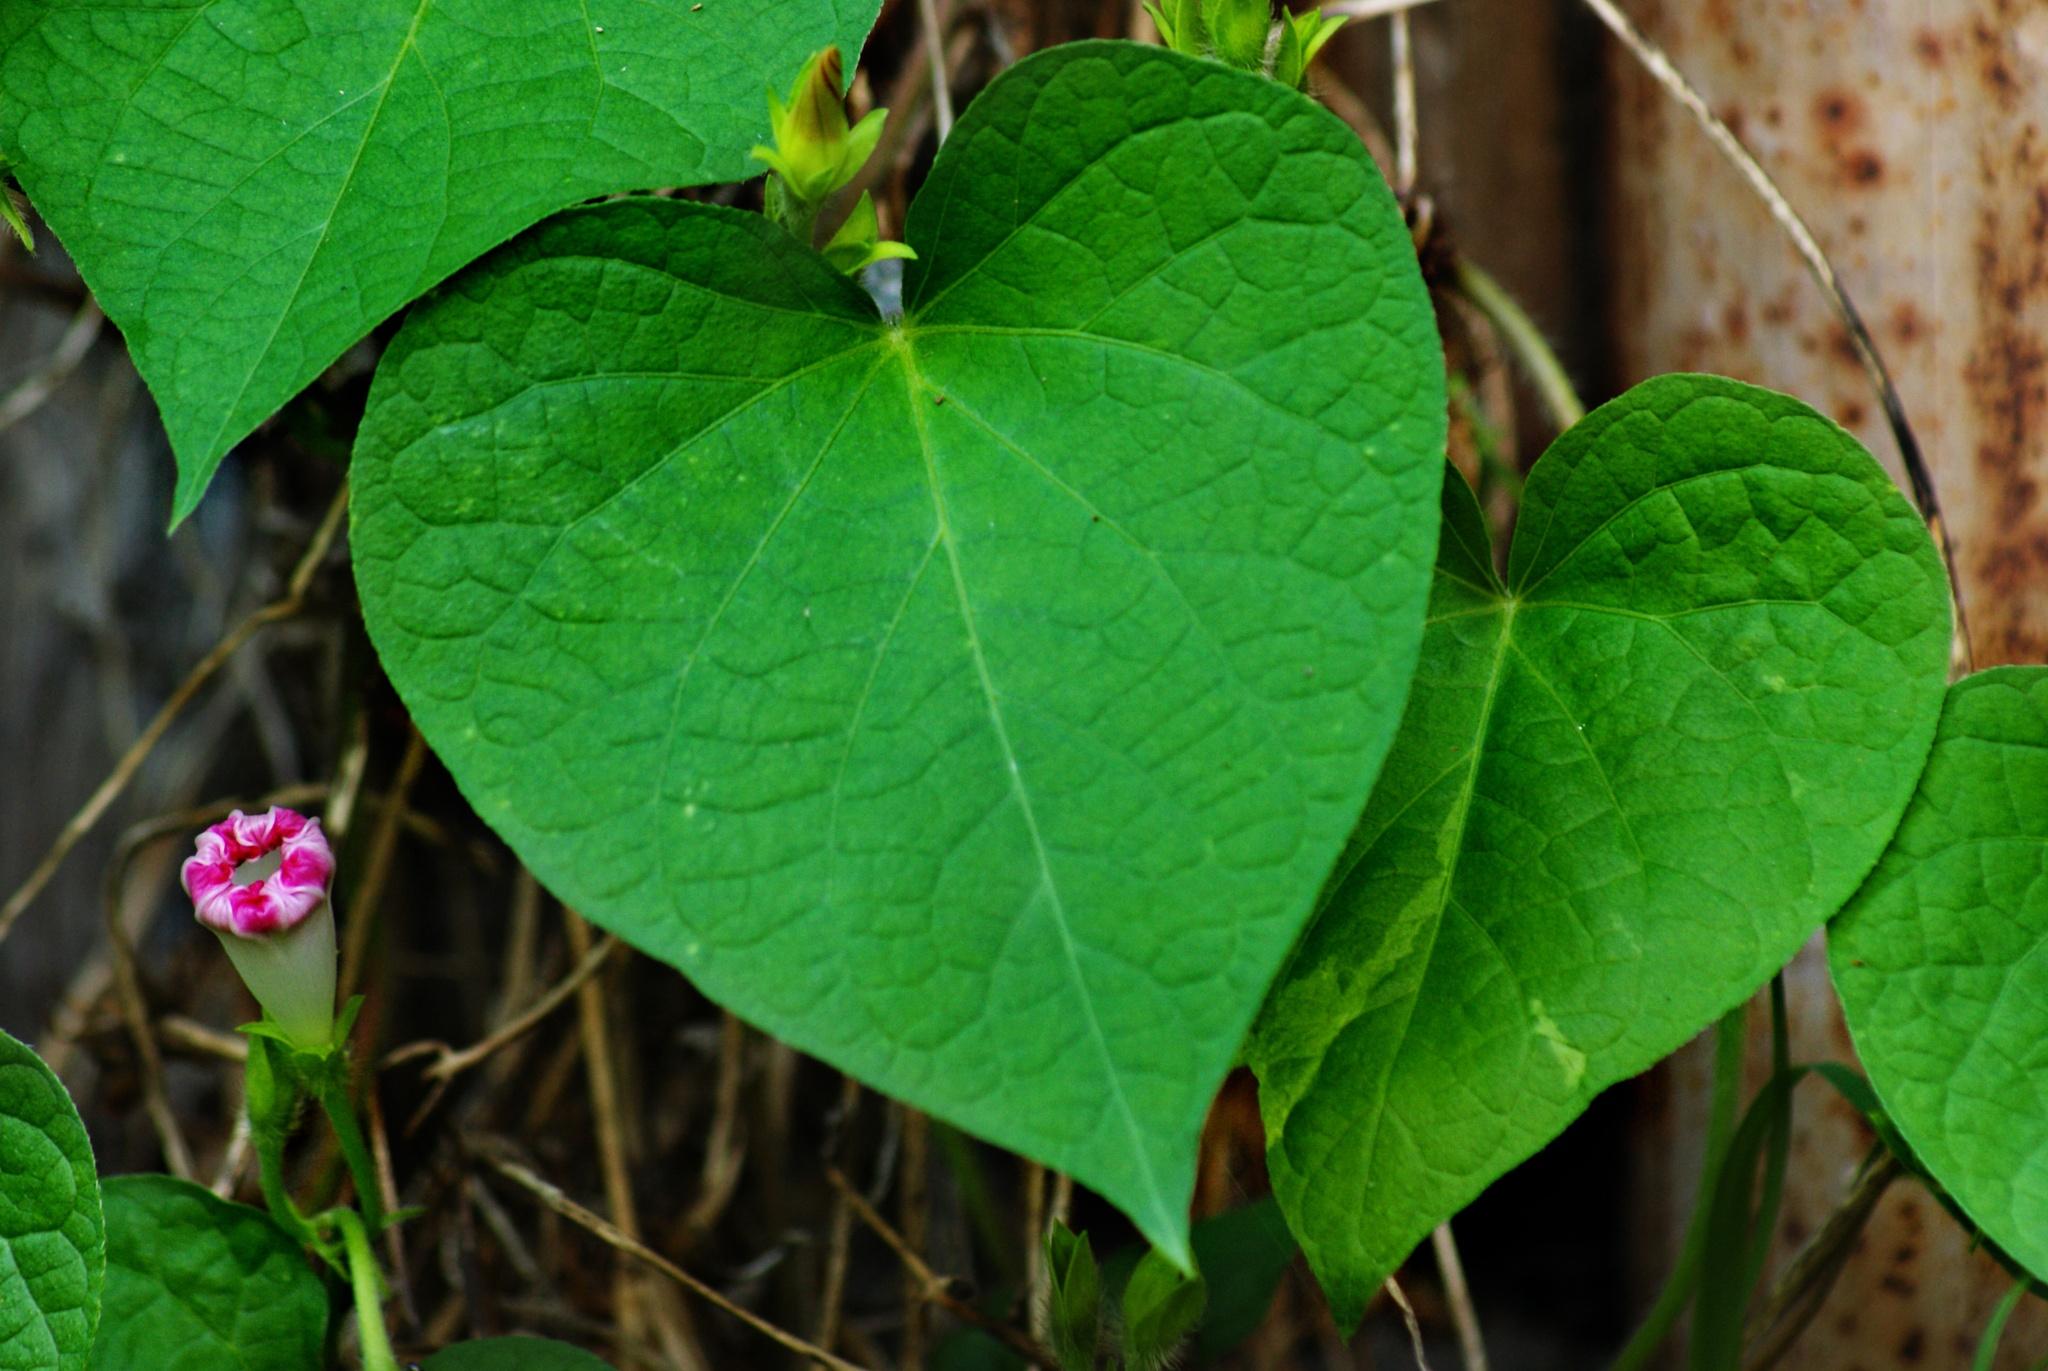 green heart by edyctin